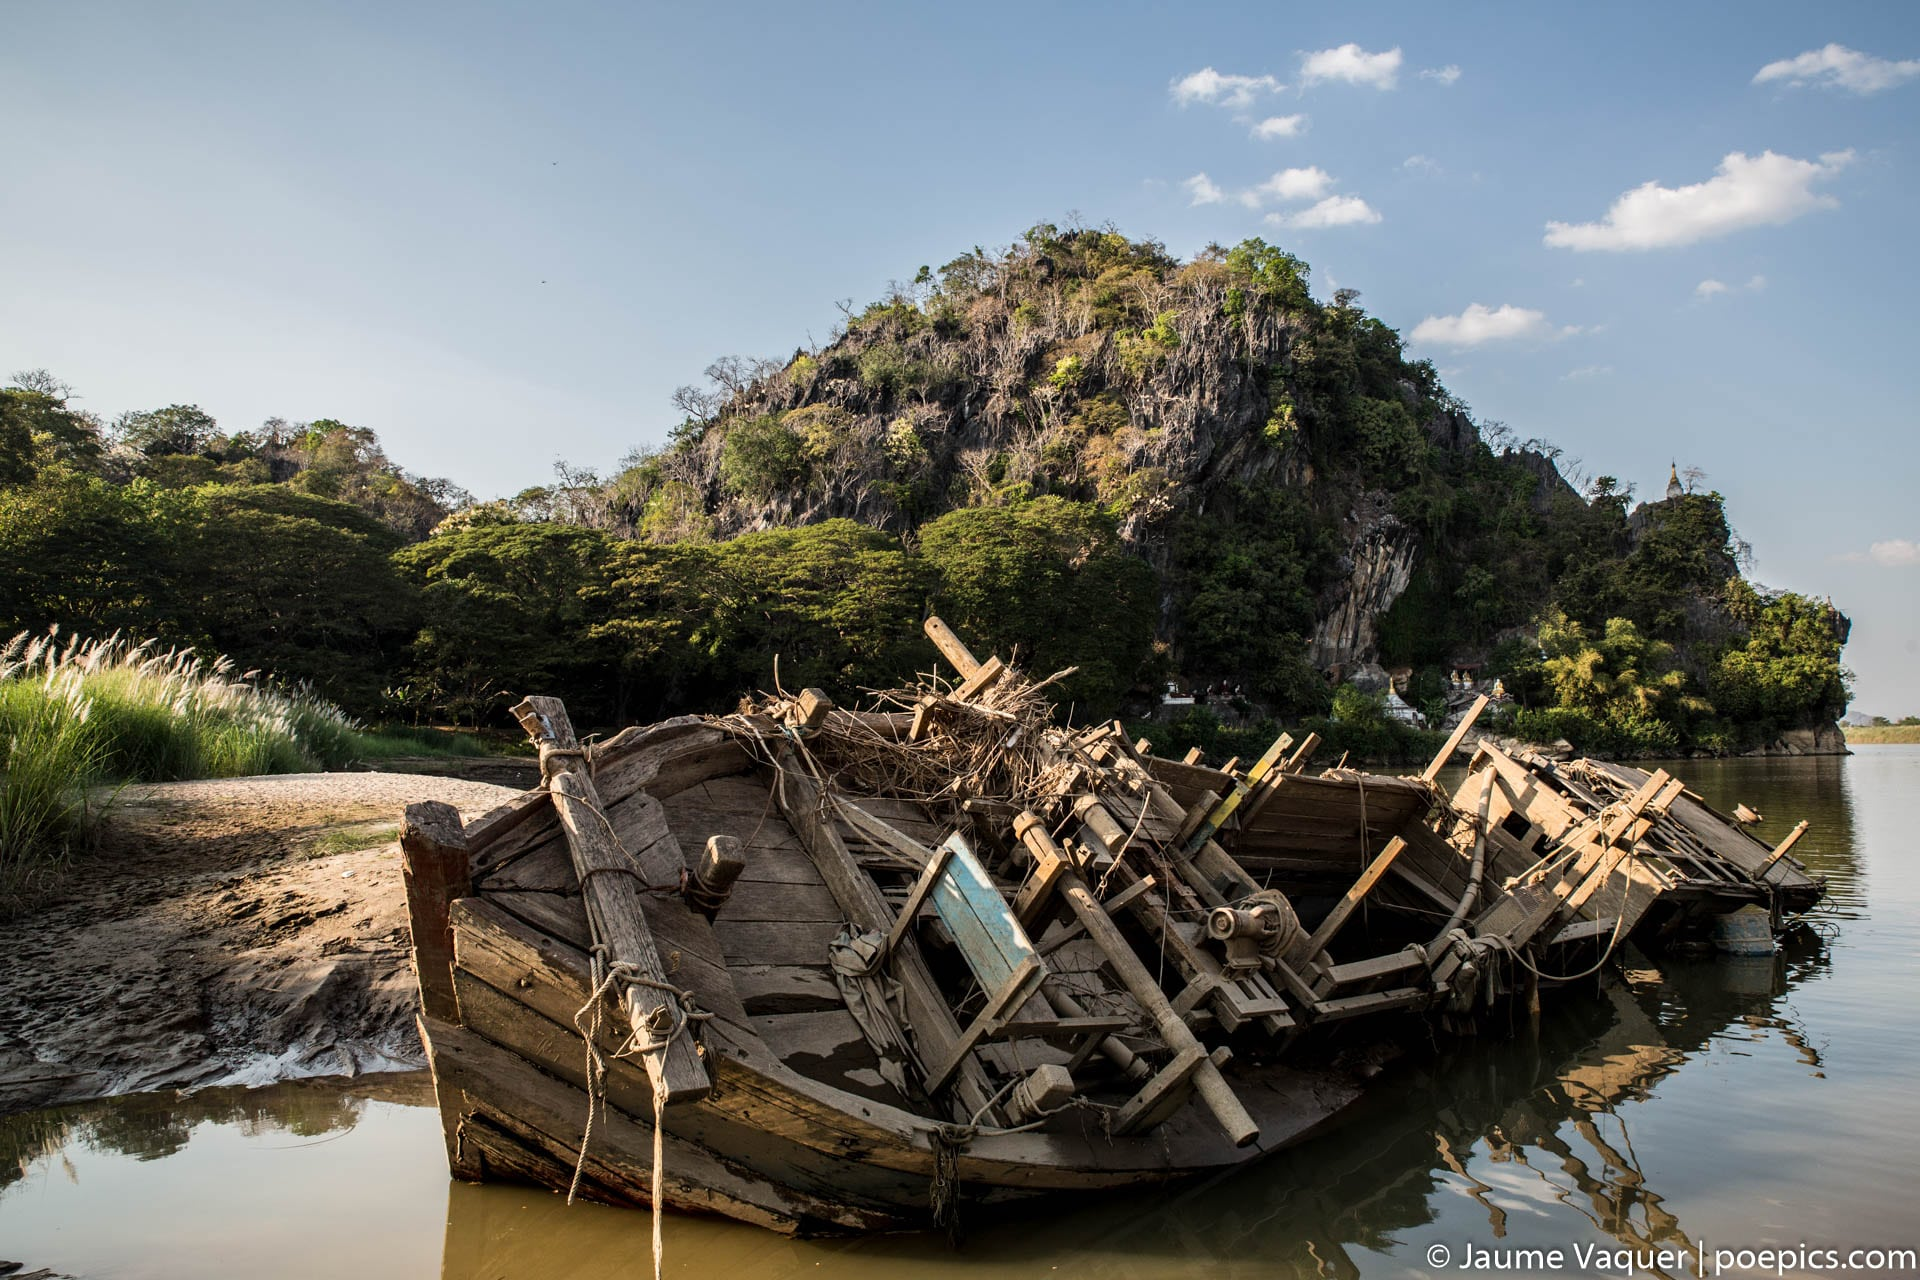 Ships cemetery in Hpa-An, Myanmar (Burma)